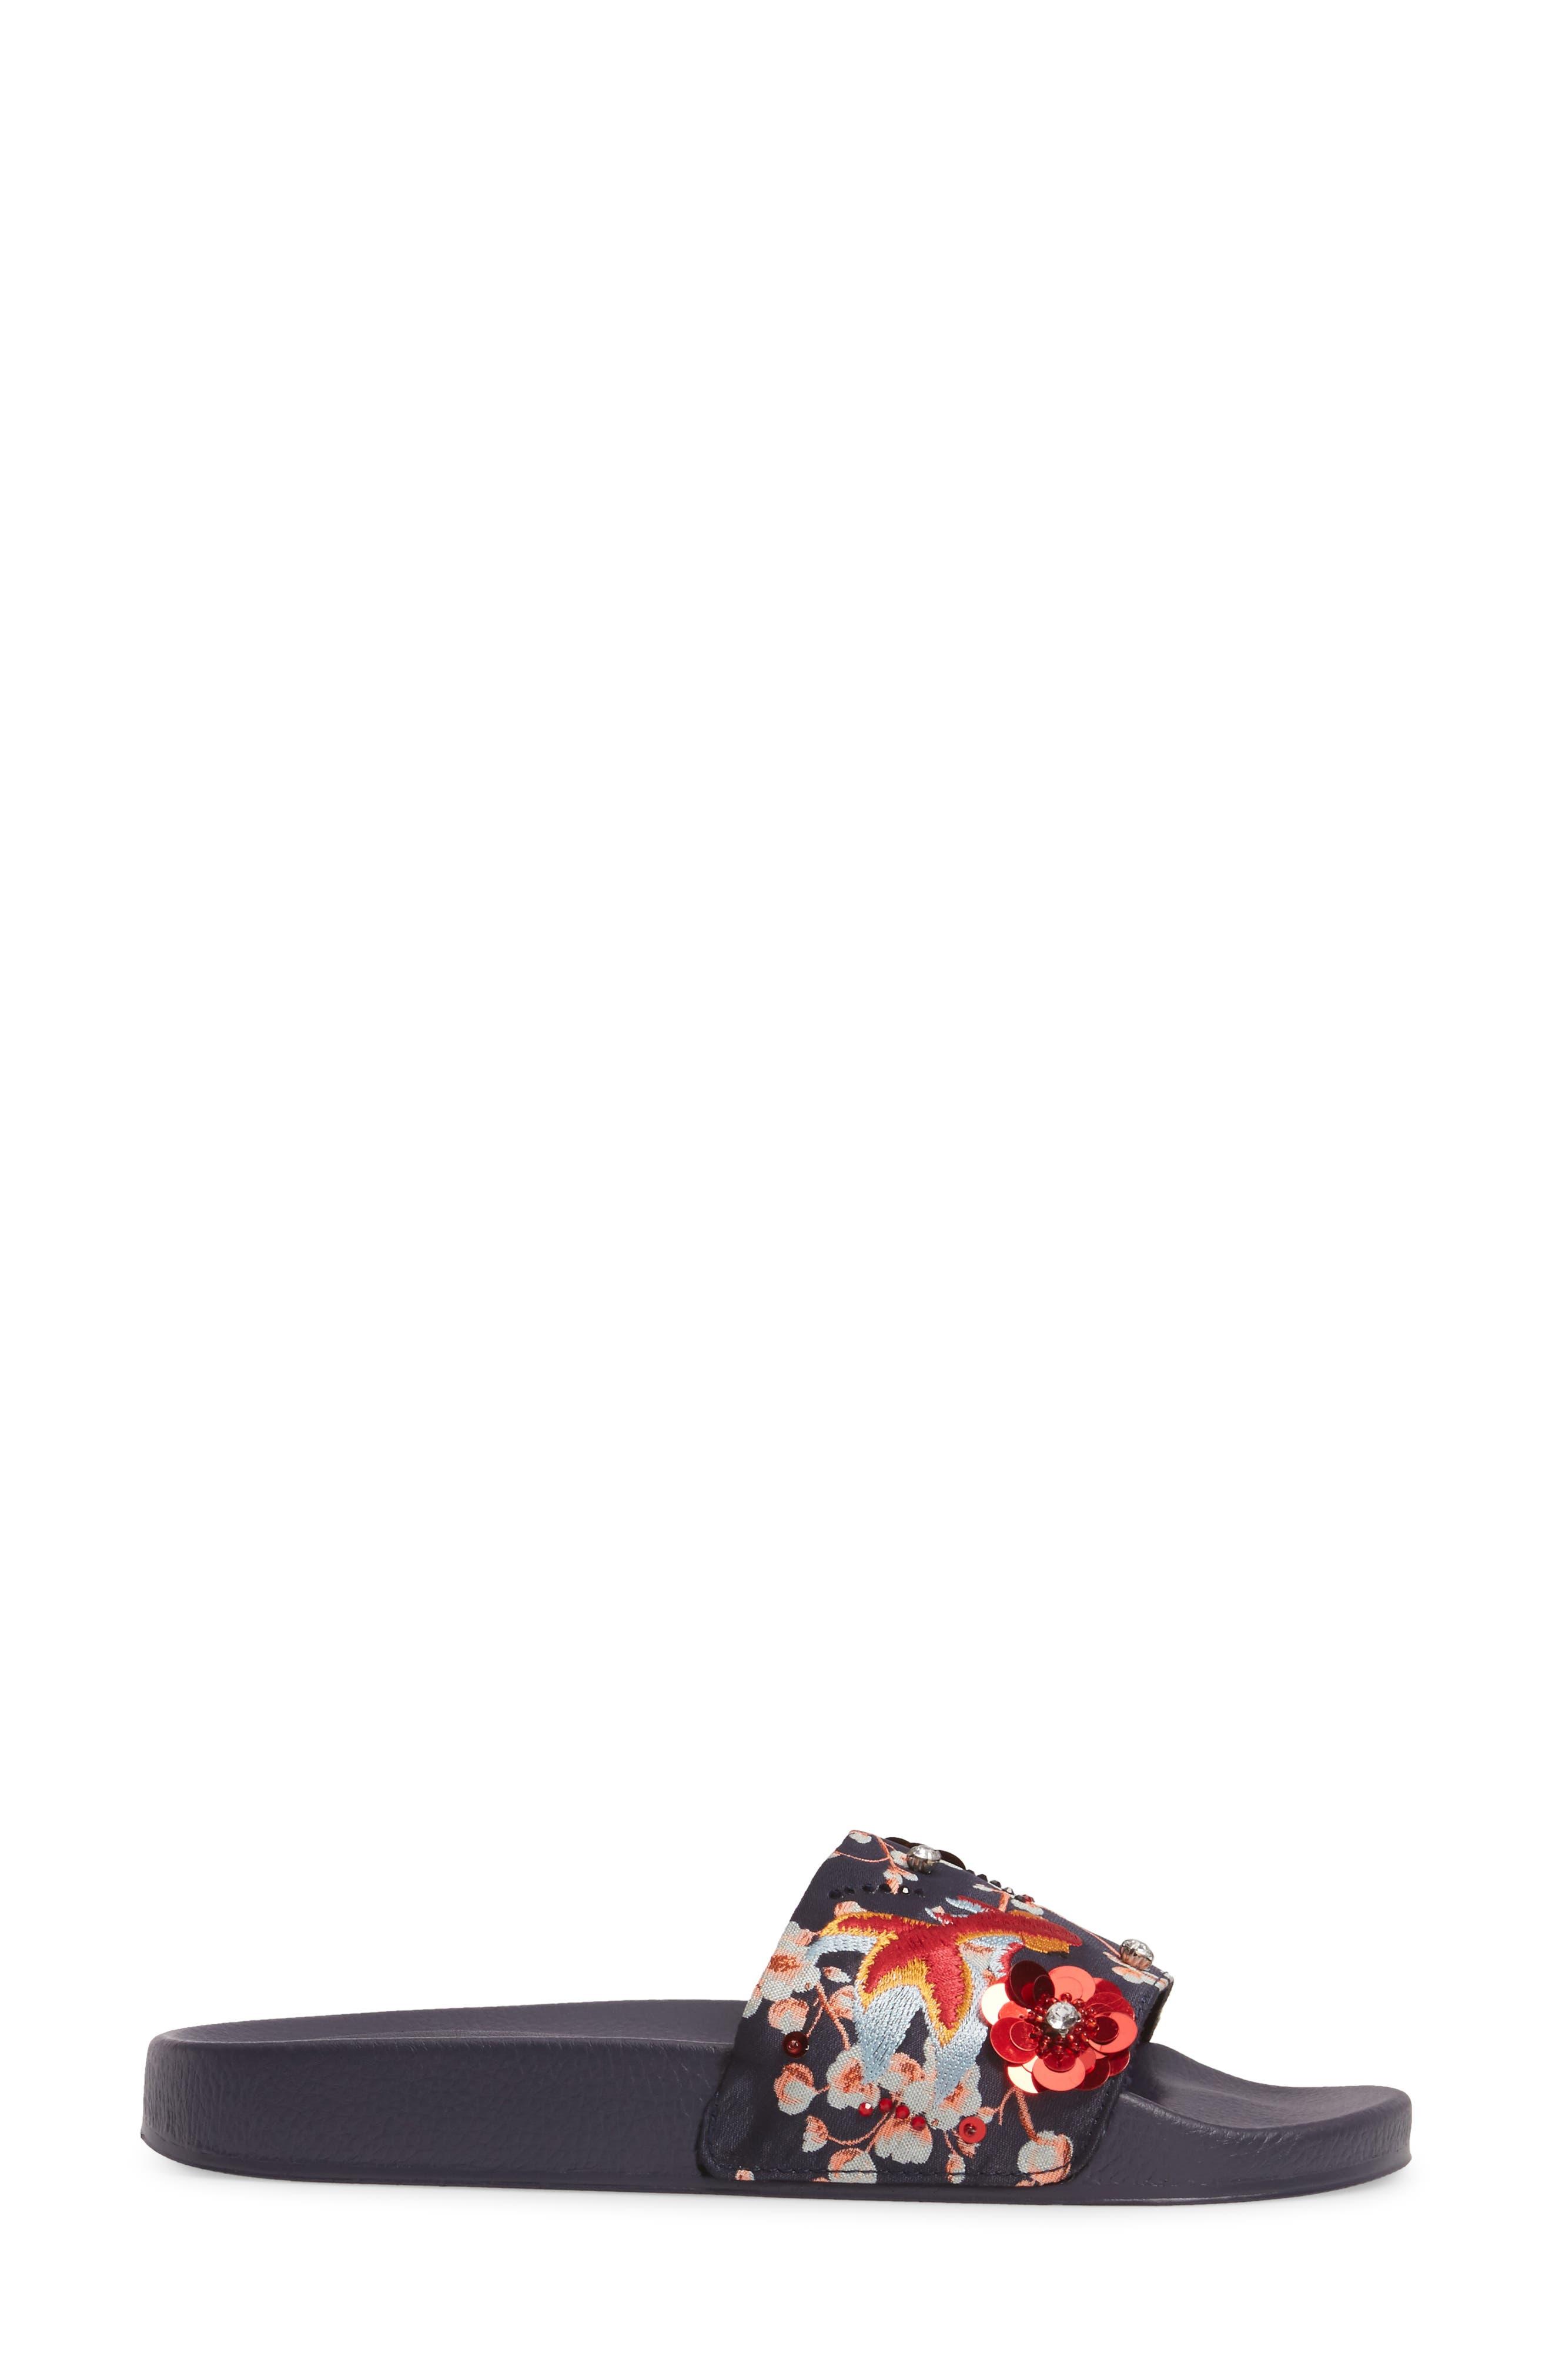 HERRING Goldfish Embellished Slide Sandal,                             Alternate thumbnail 5, color,